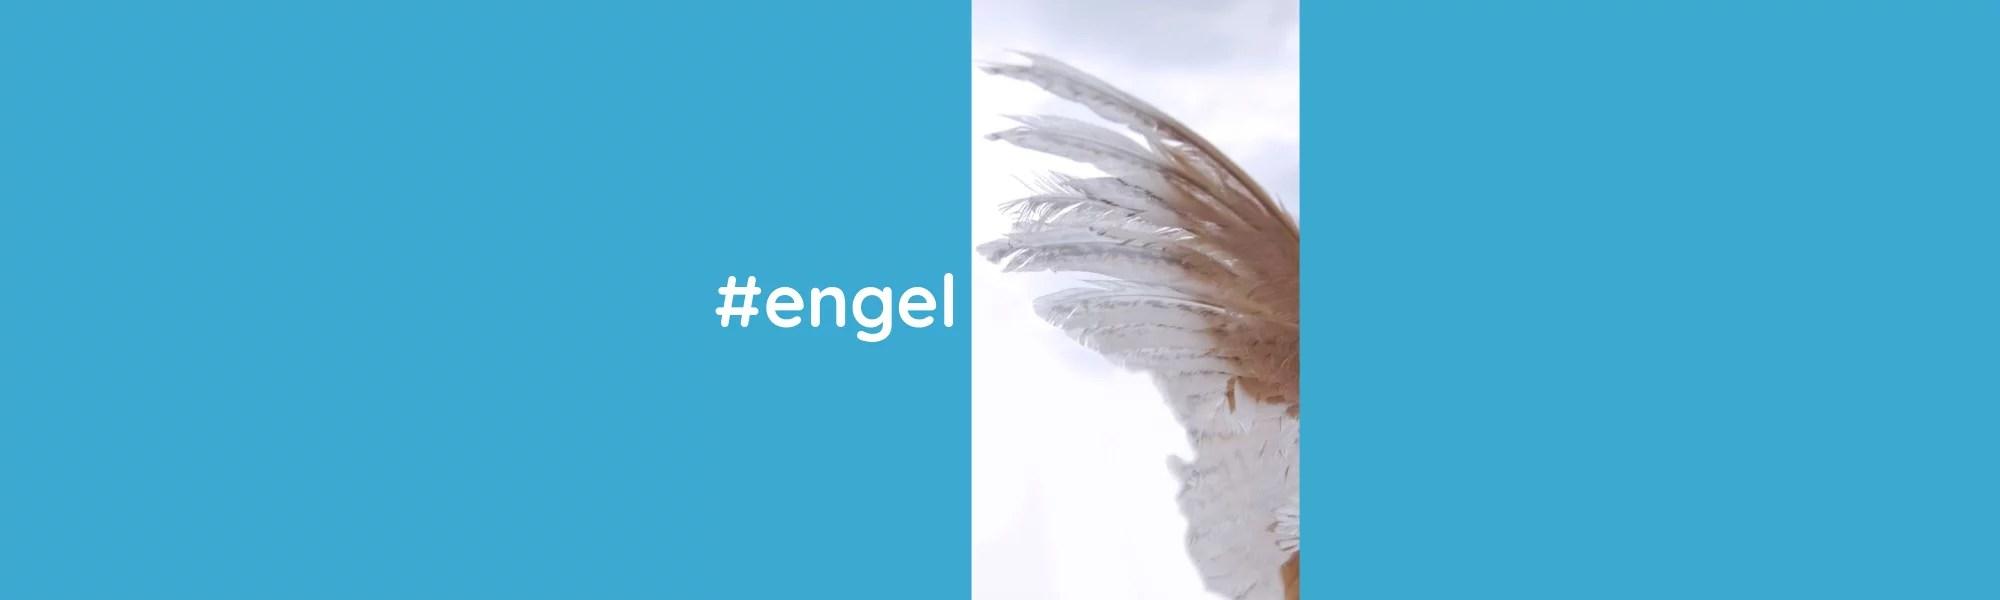 Kopie von Kopie von Kopie von engel 20190923 - #engel